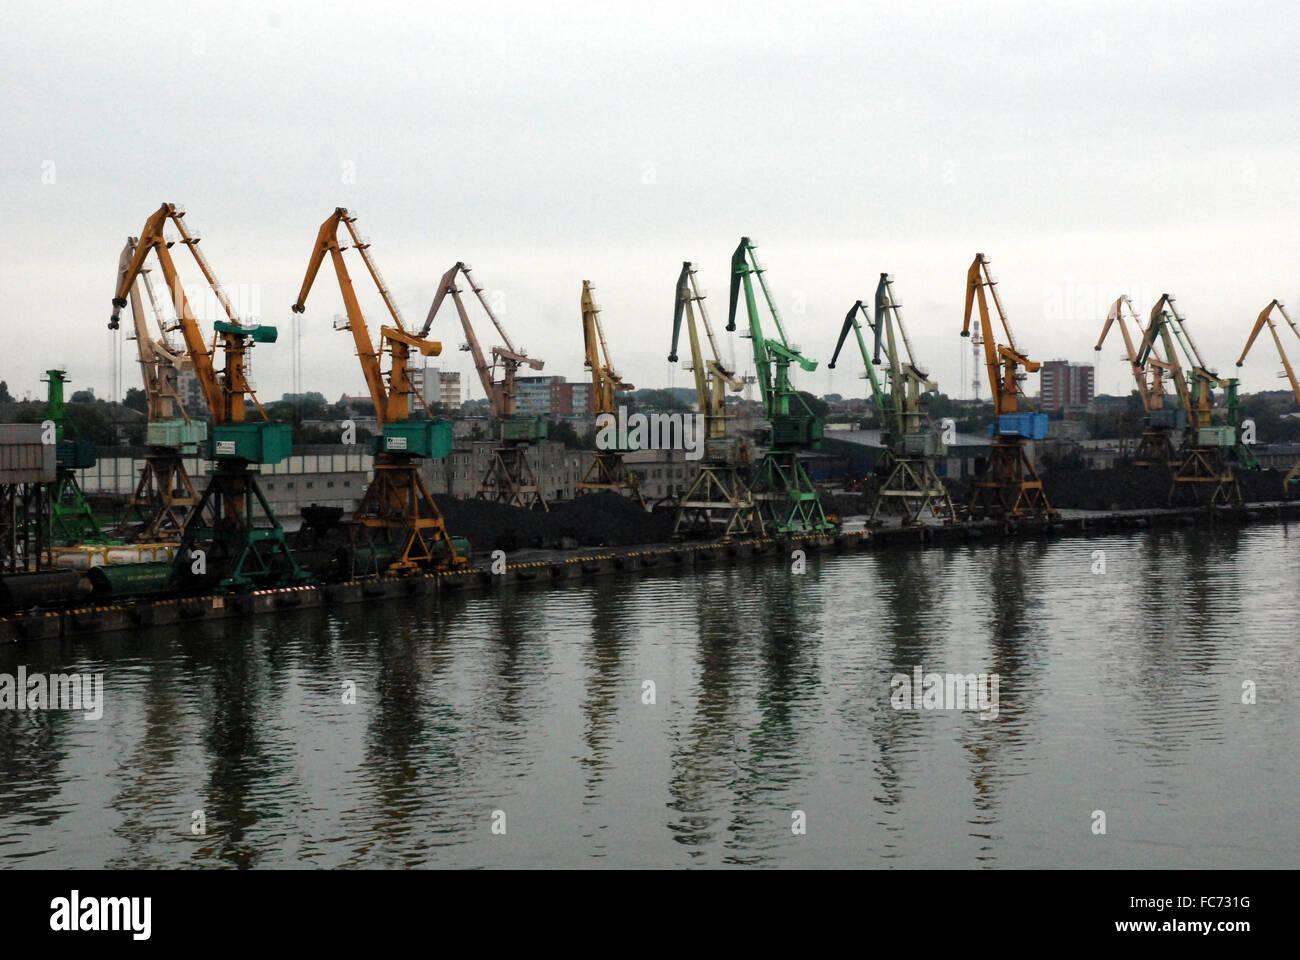 dockside cranes - Stock Image